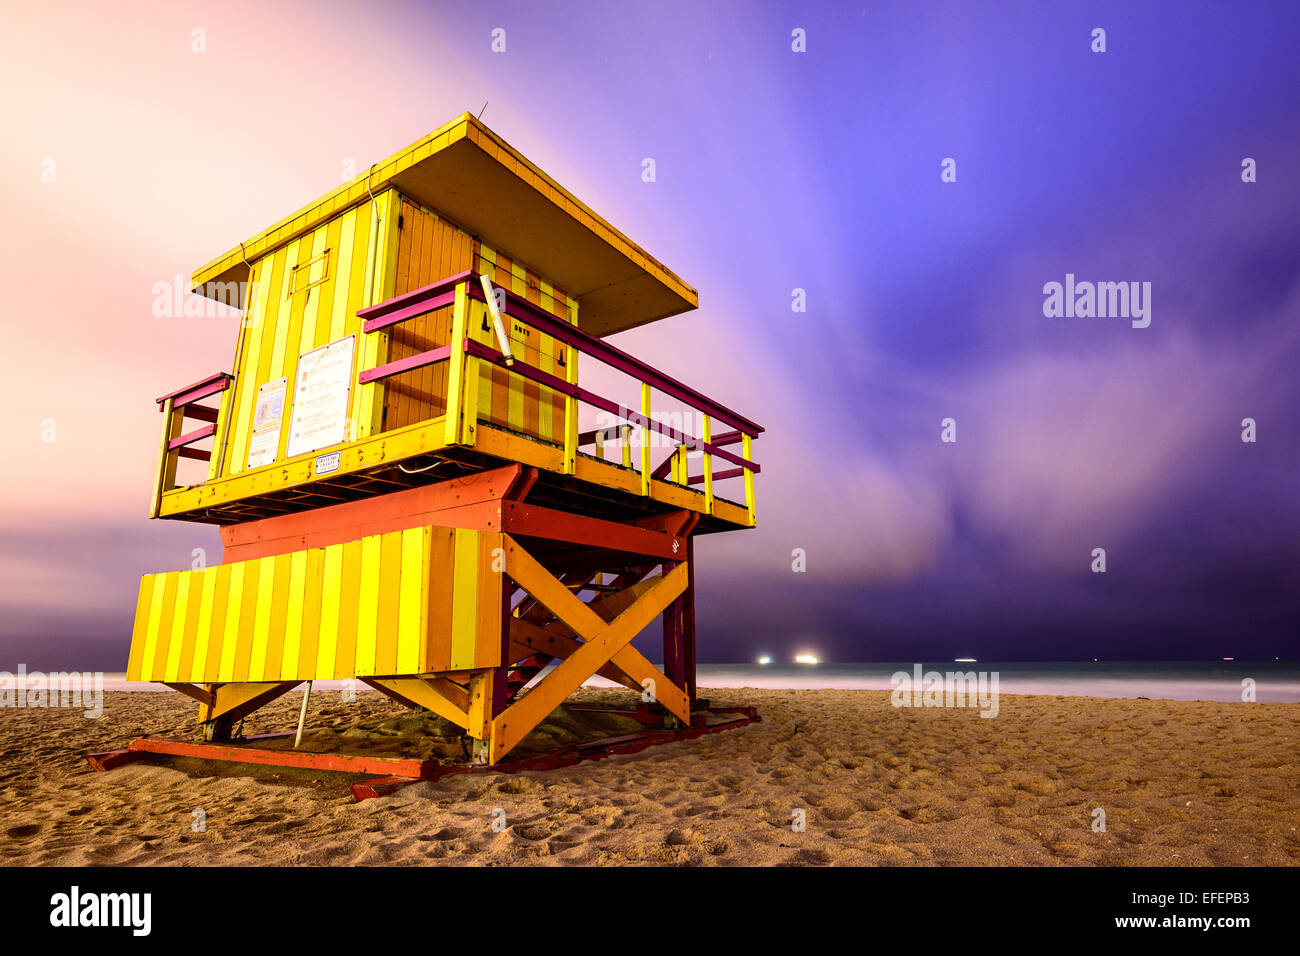 Lifeguard tower on Miami Beach. - Stock Image